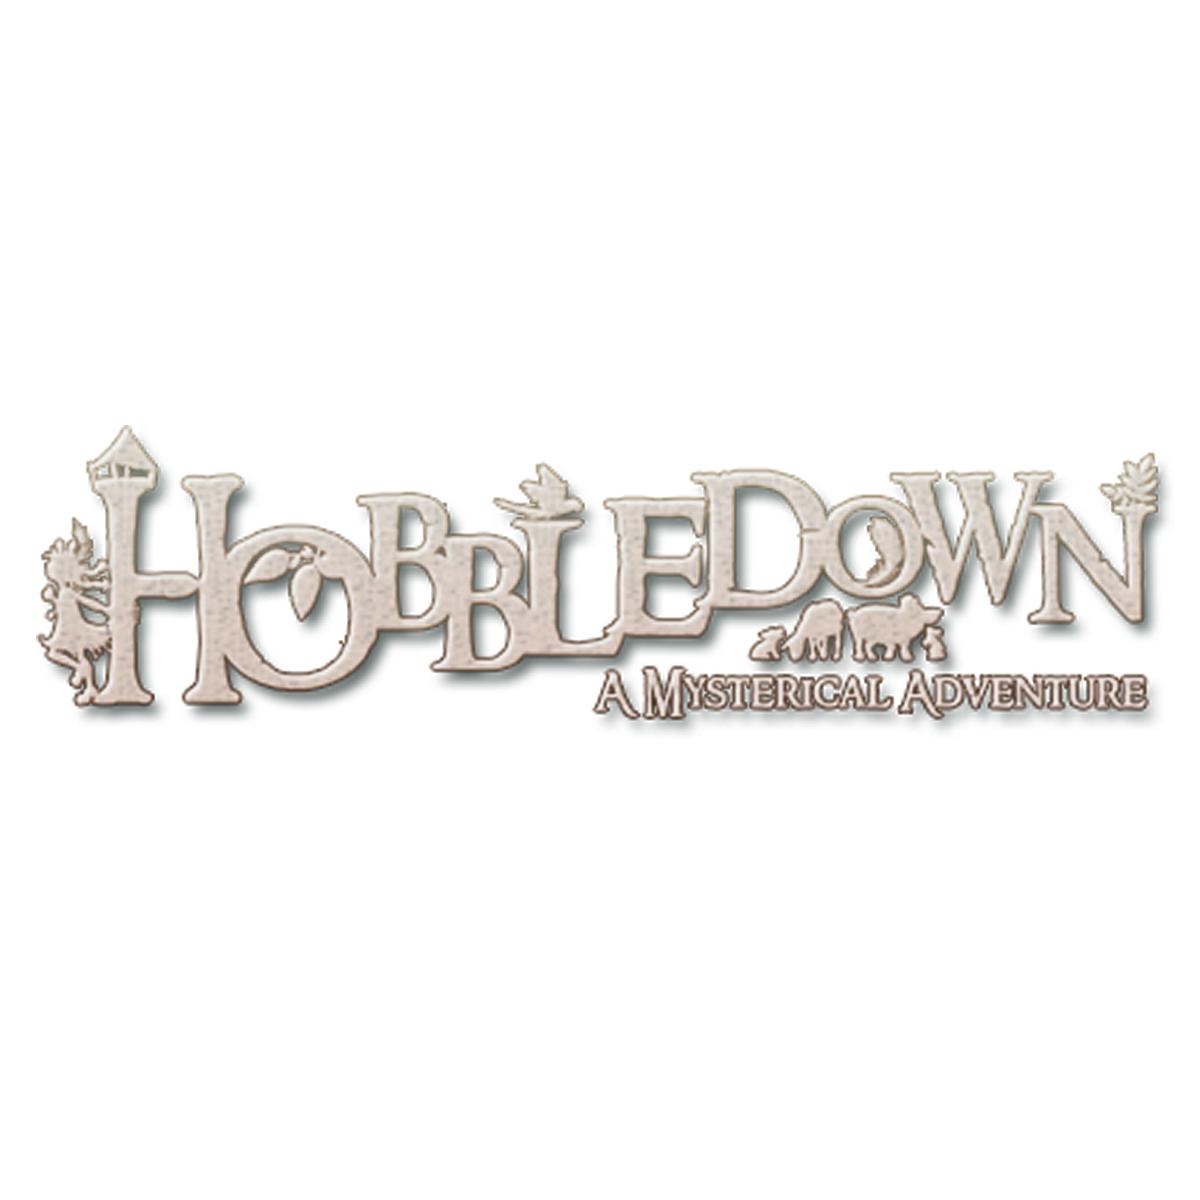 Hobbledown